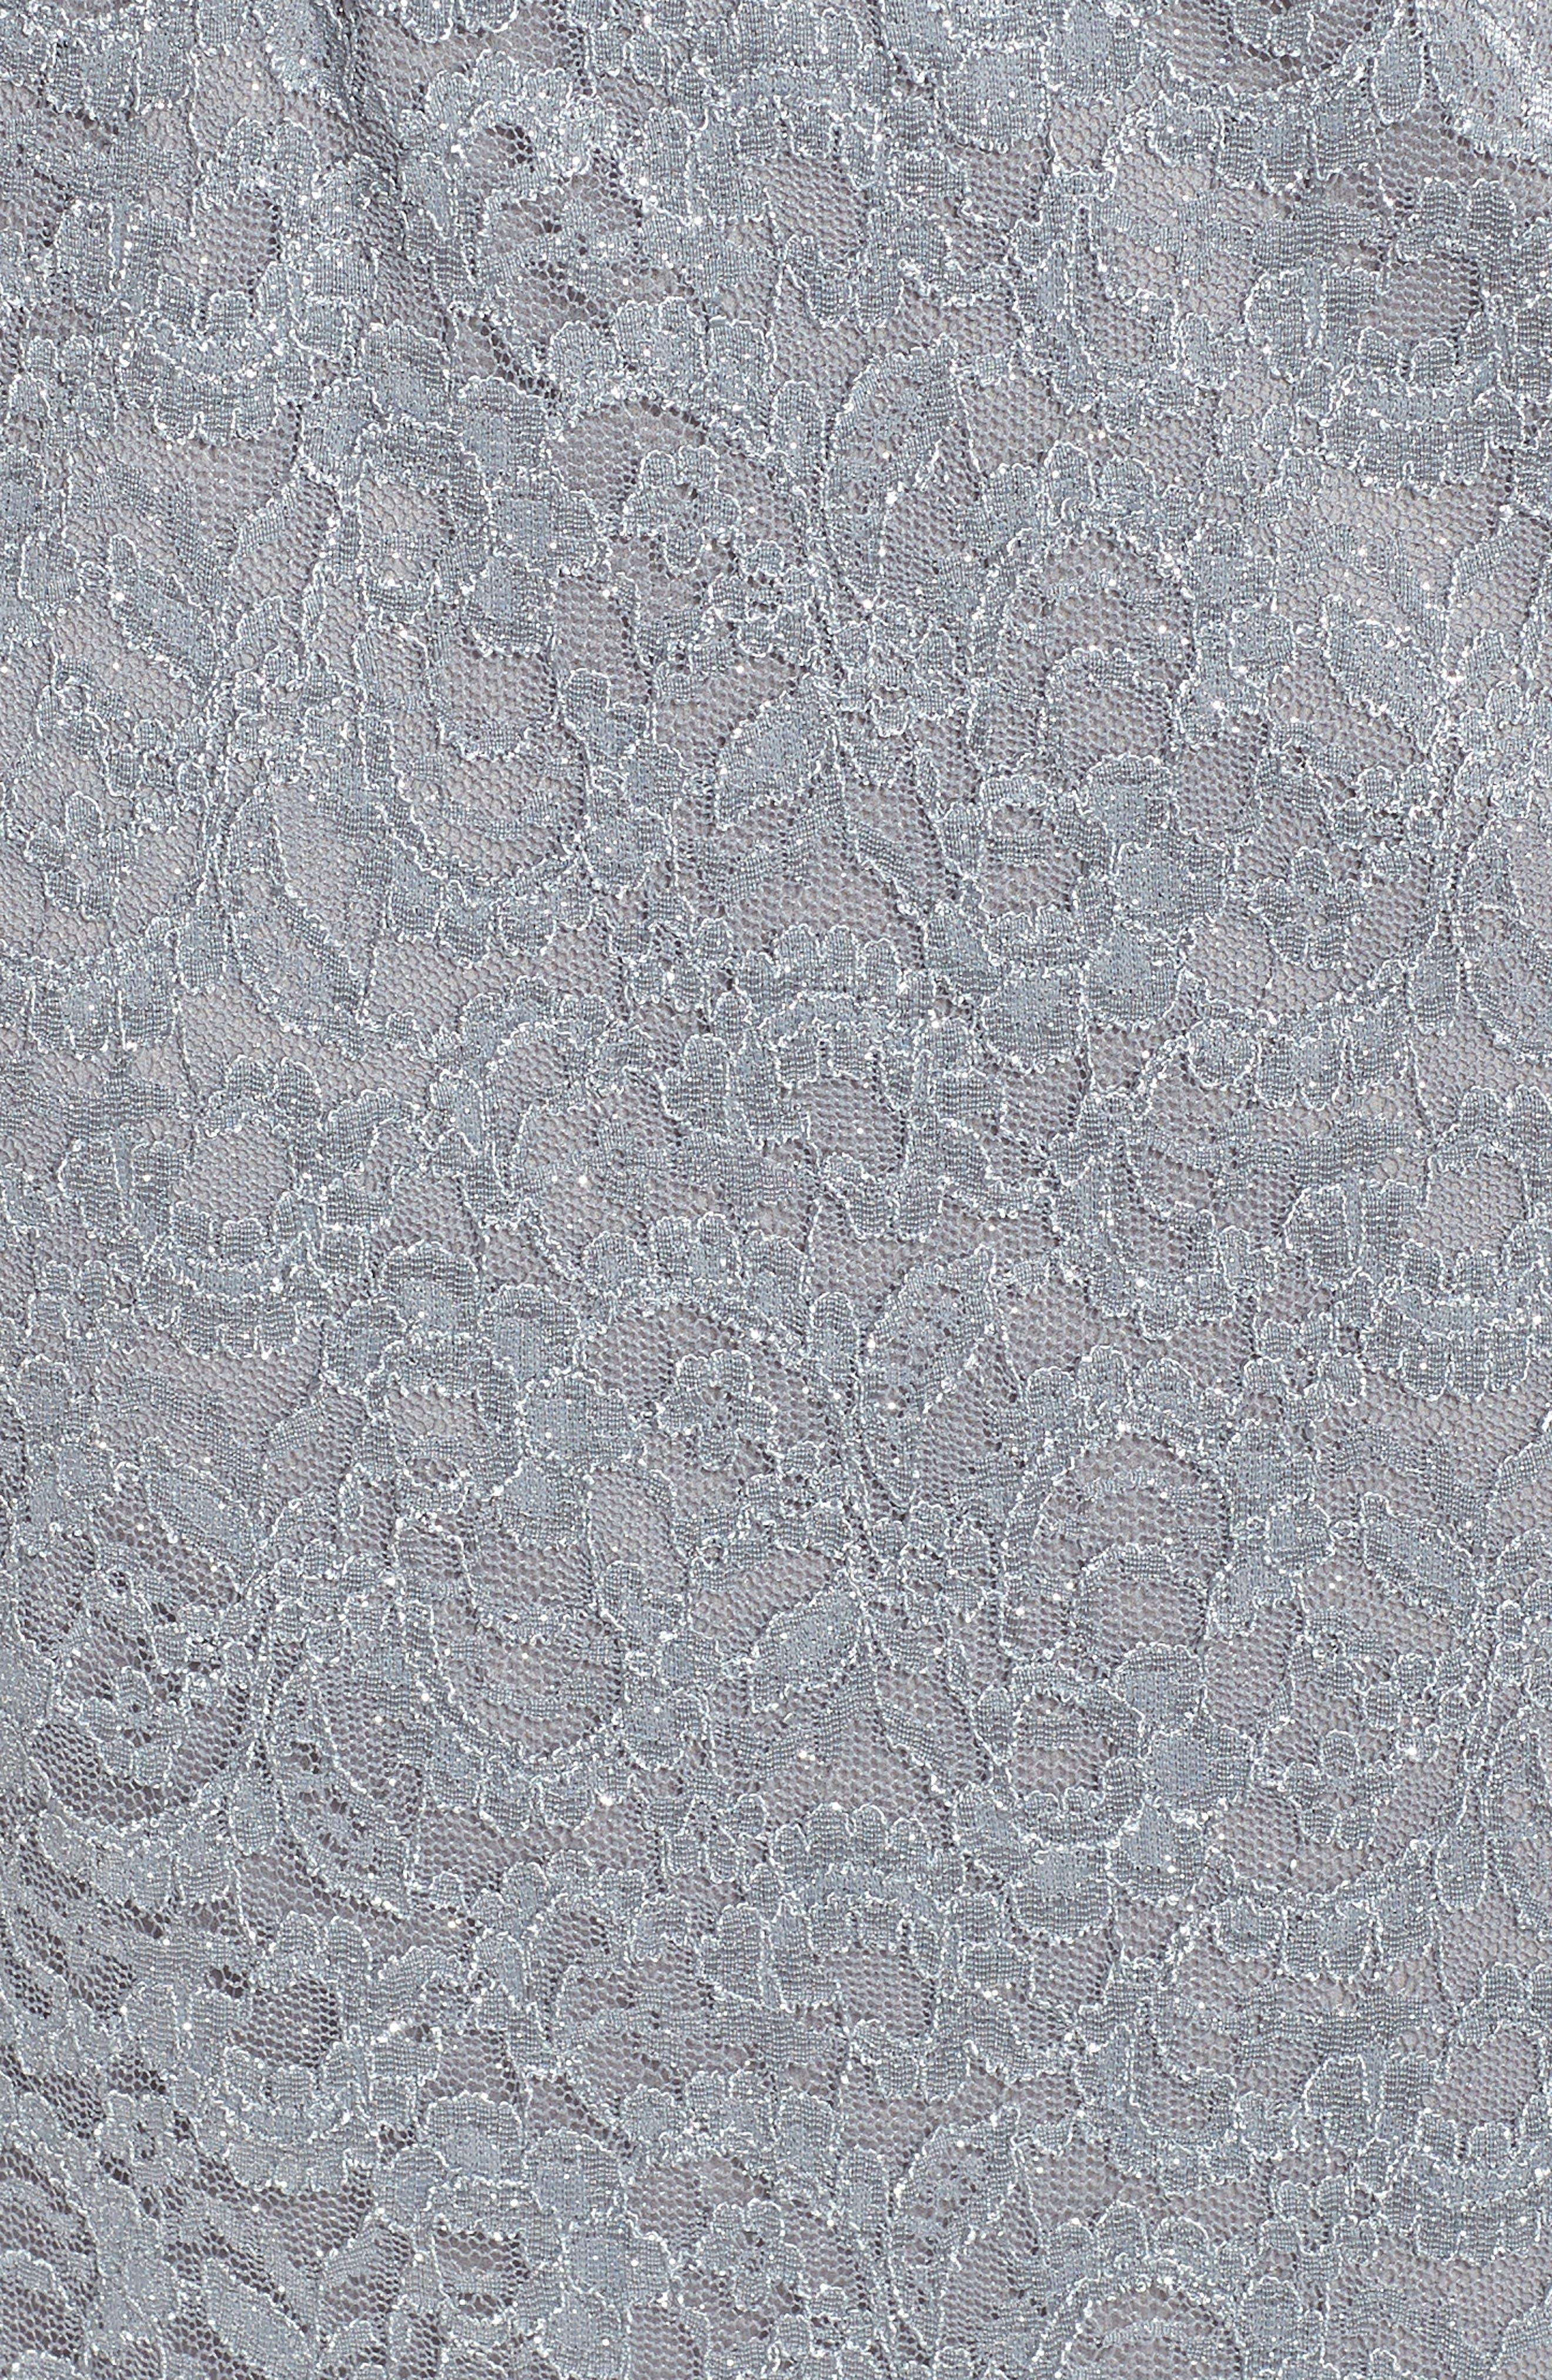 Lace Sheath Dress with Bolero Jacket,                             Alternate thumbnail 5, color,                             Silver